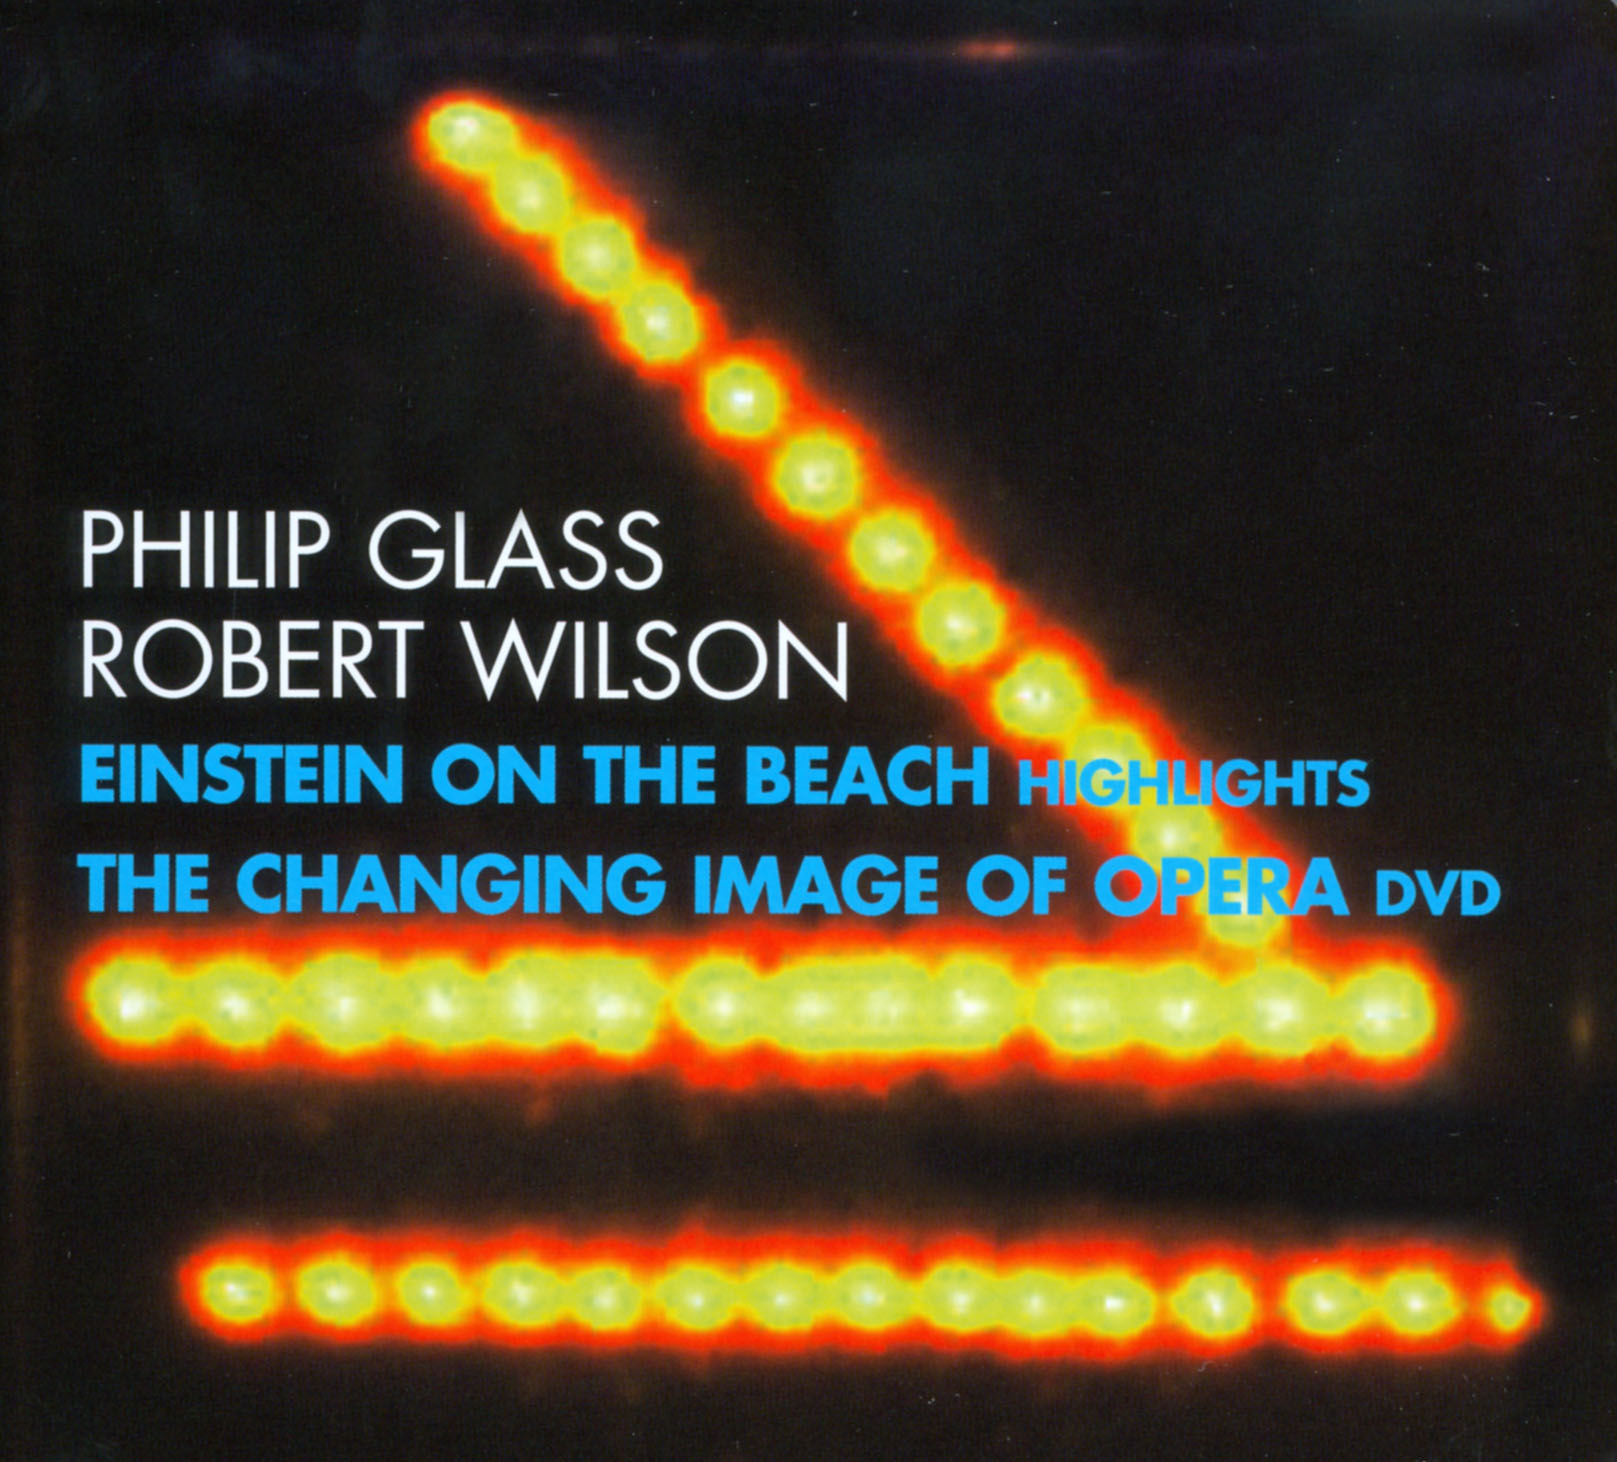 Philip Glass/Robert Wilson: Einstein on the Beach - The Changing Image of Opera